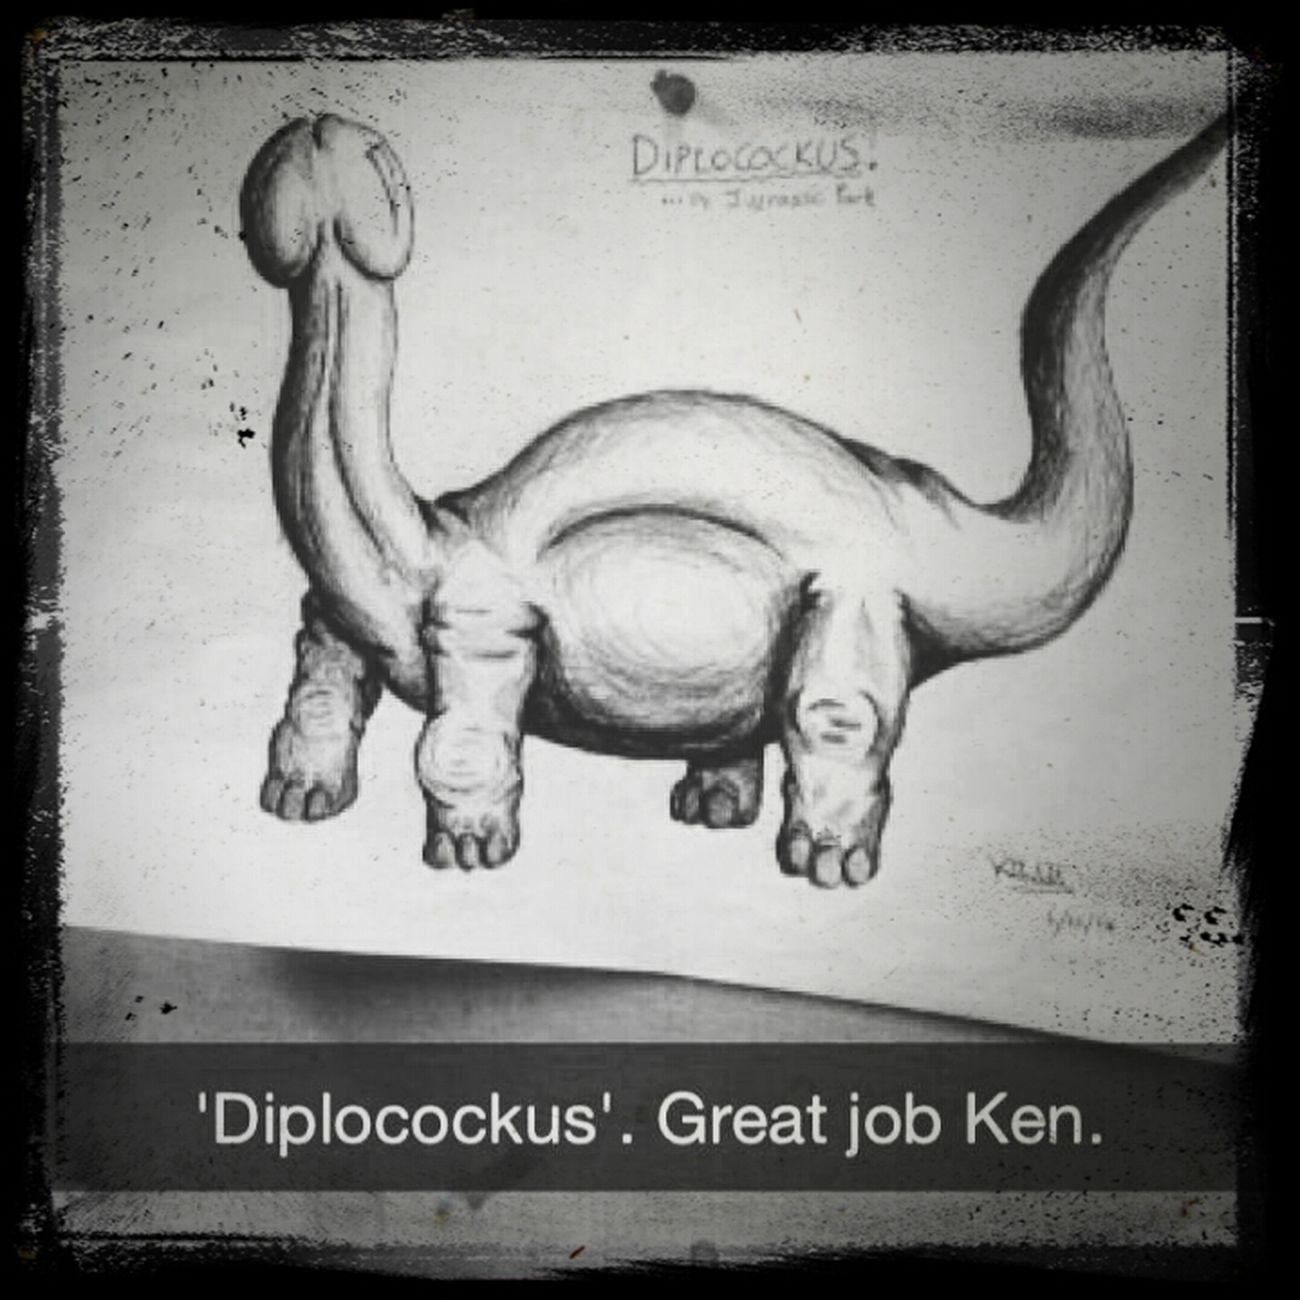 Dinosaur Diplocockus Drawing Details